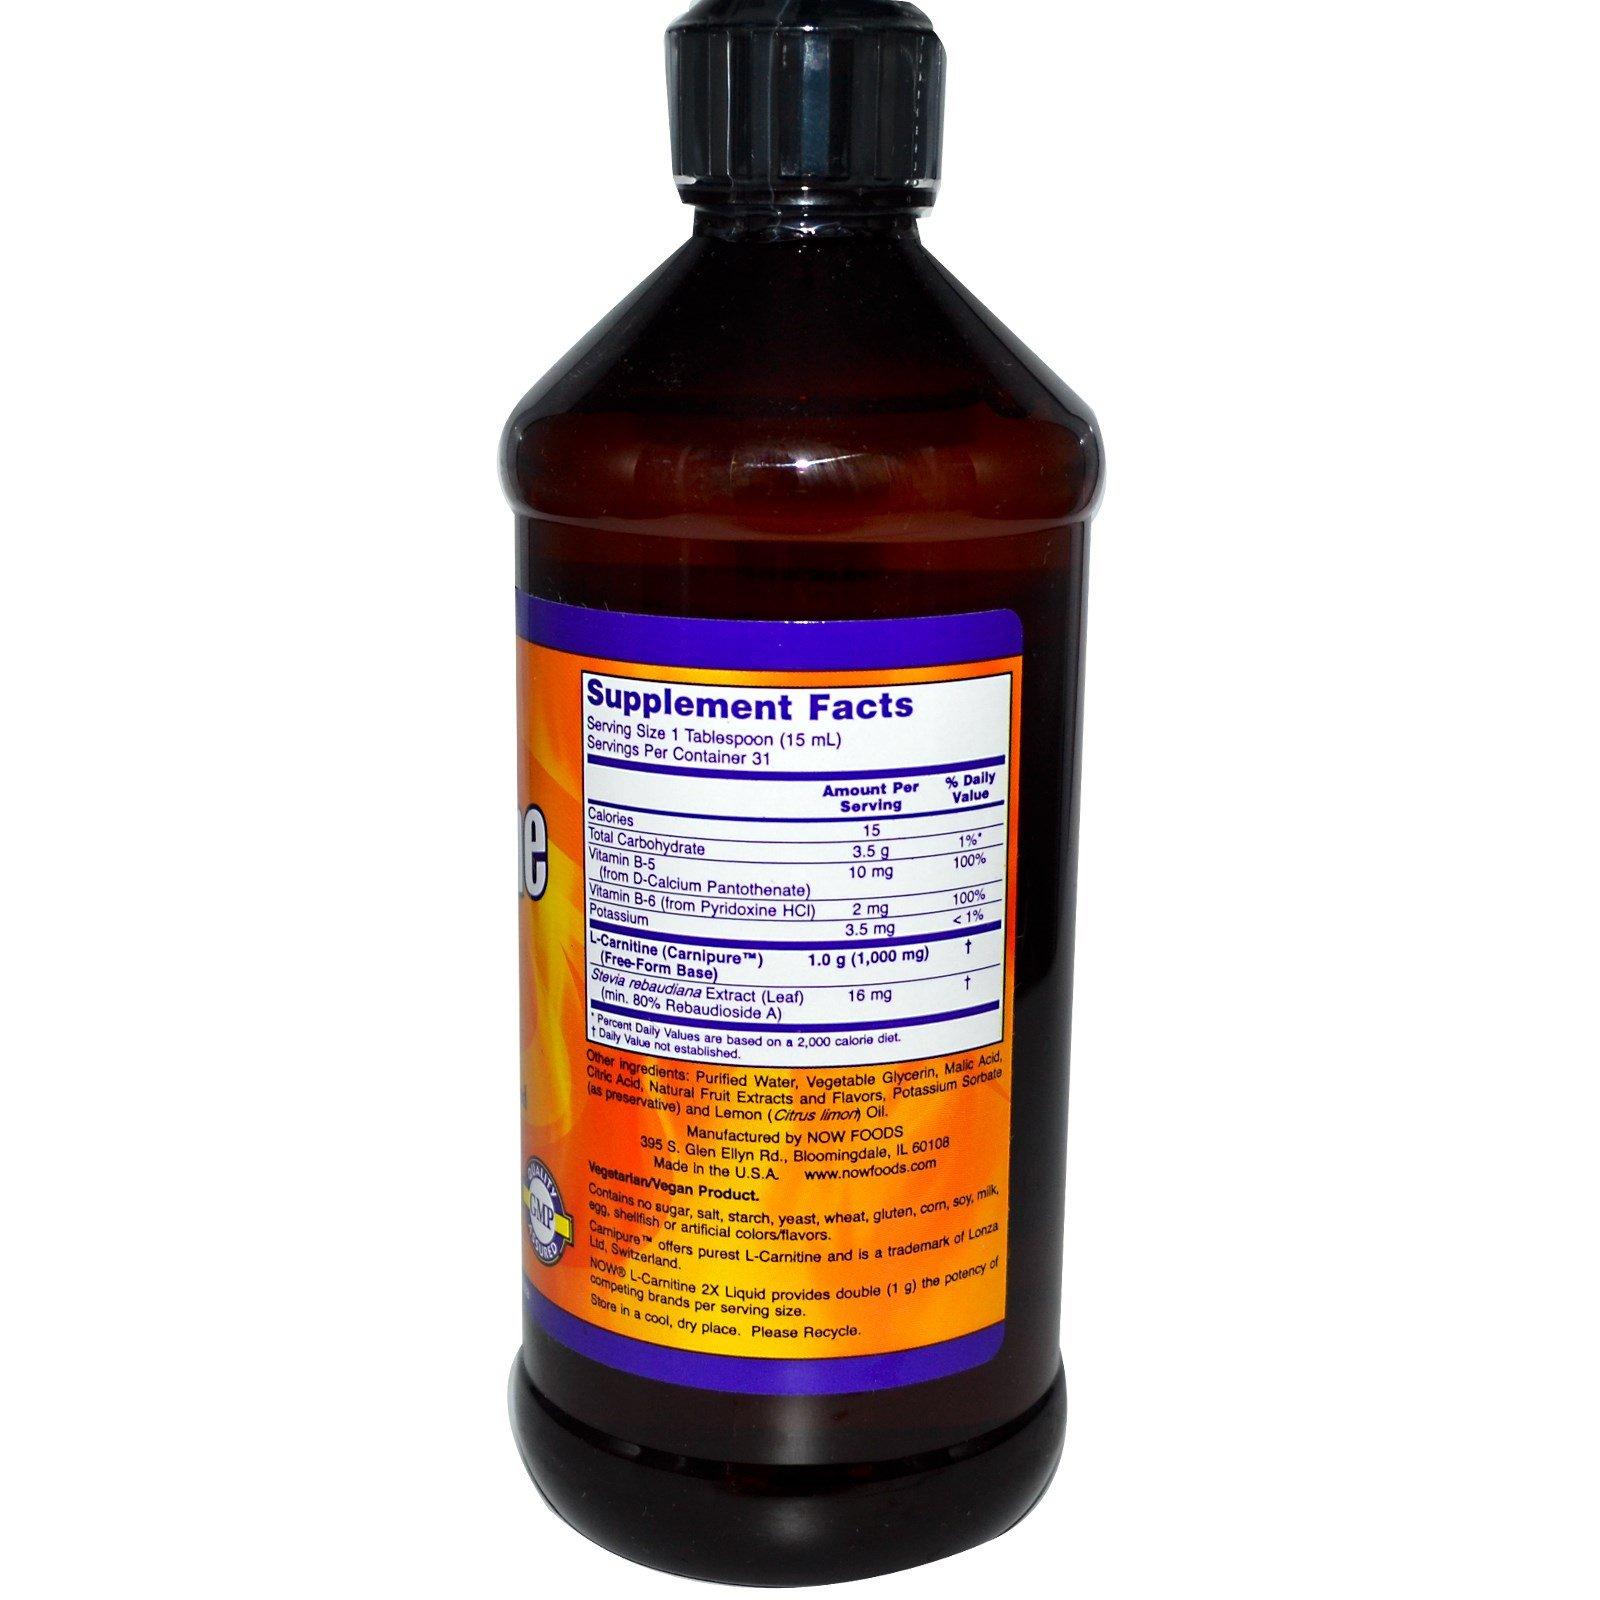 NOW Foods L-Carnitine Liquid, Citrus Flavor 1000 mg - 16 oz.